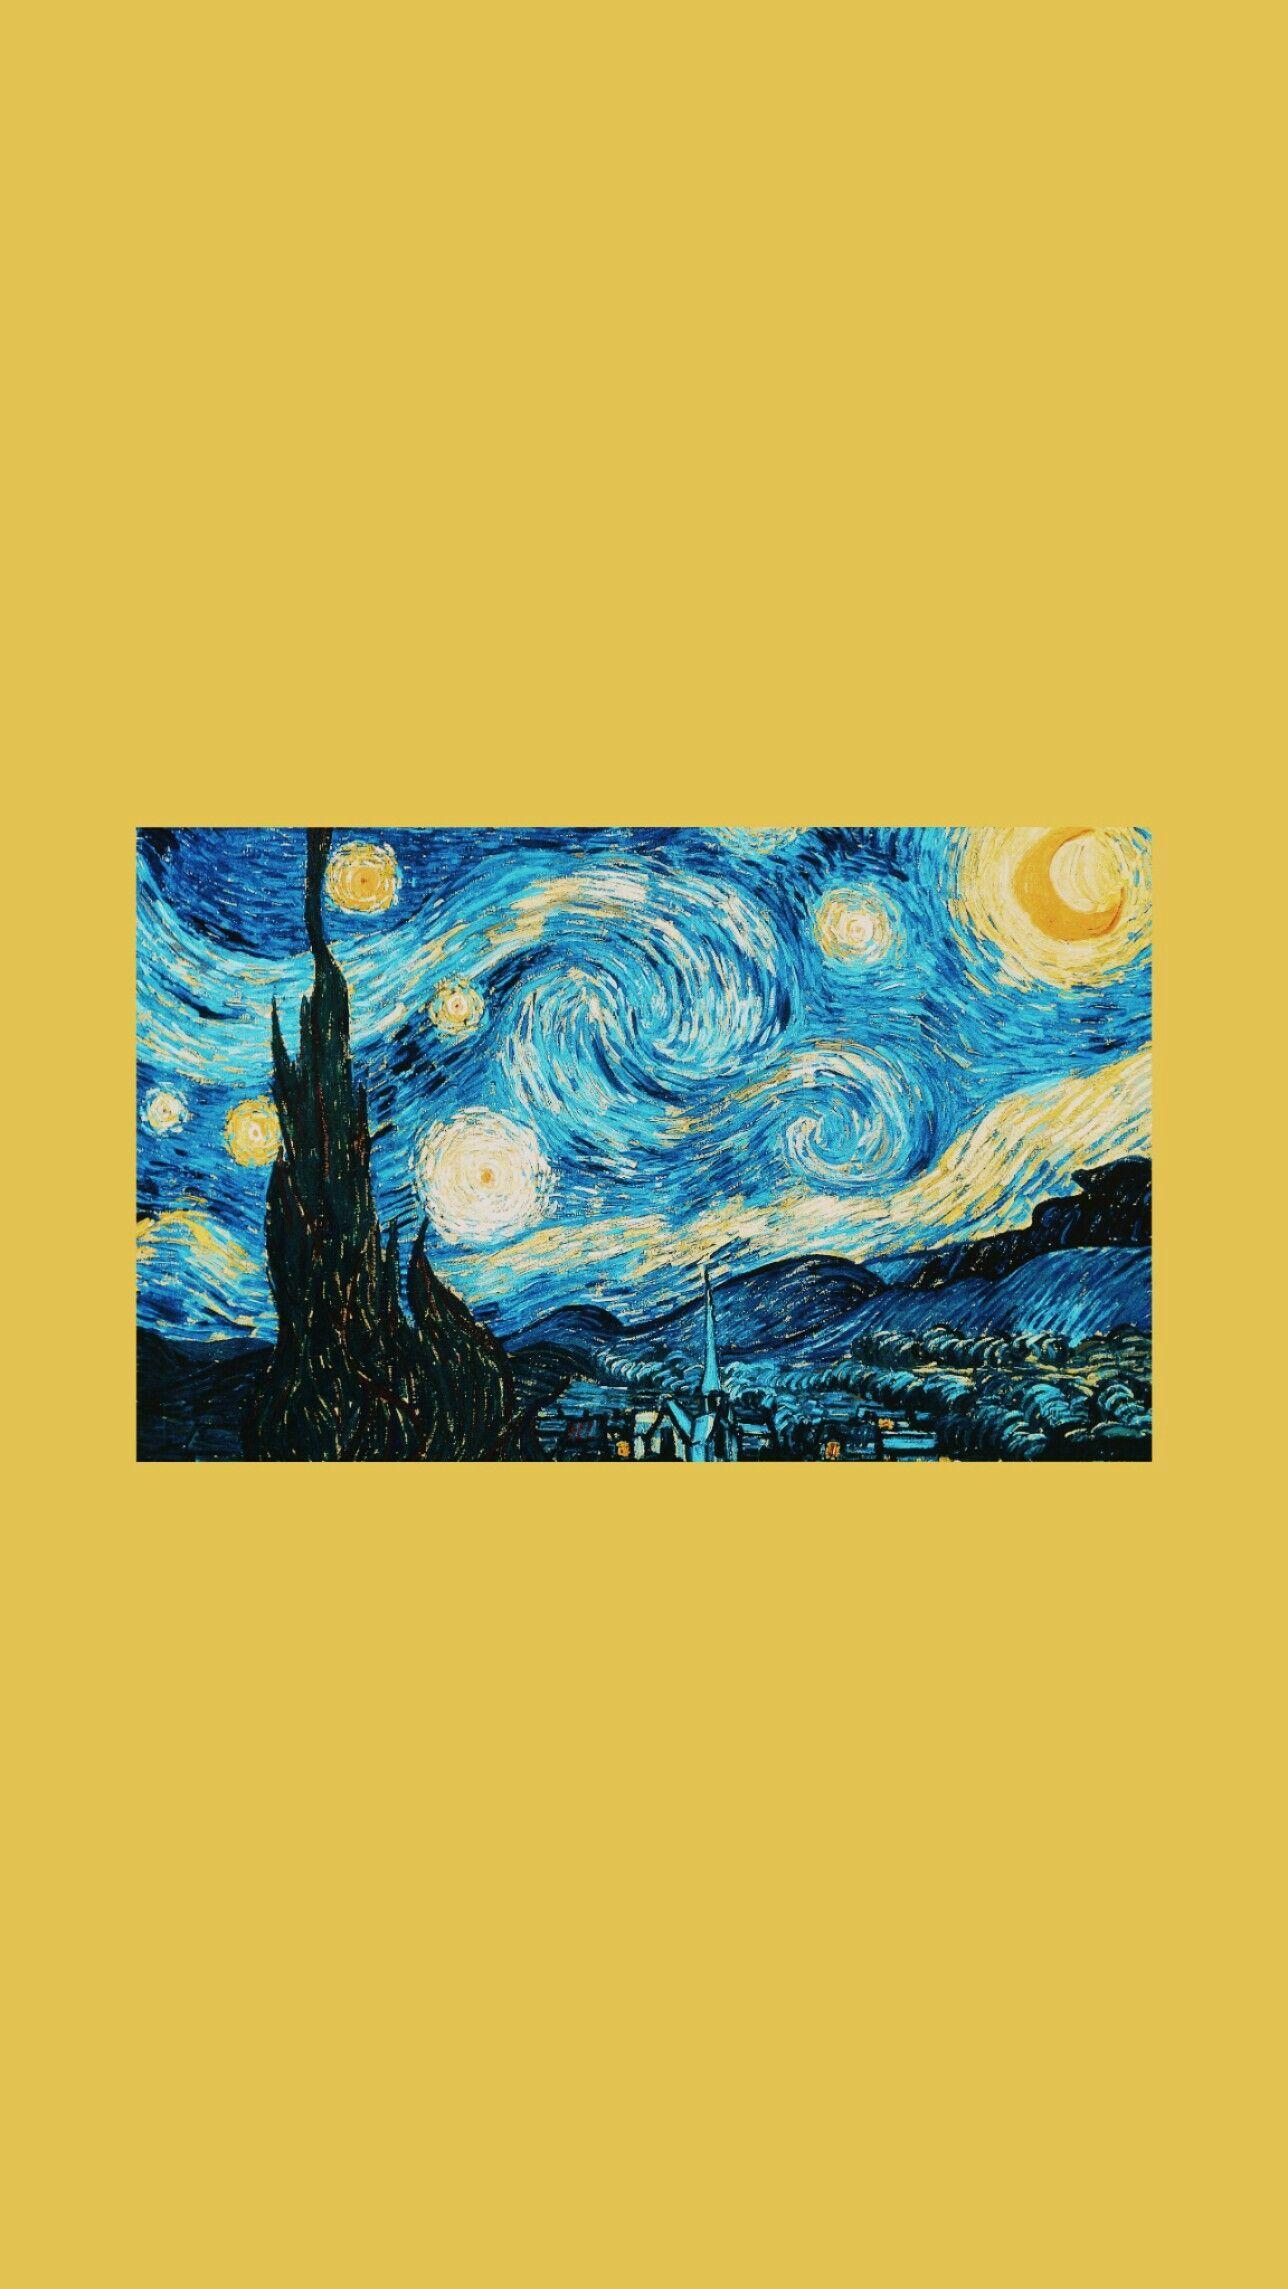 Wallpaper Van Gogh Noite Estrelada Yellow Blue Aesthetic